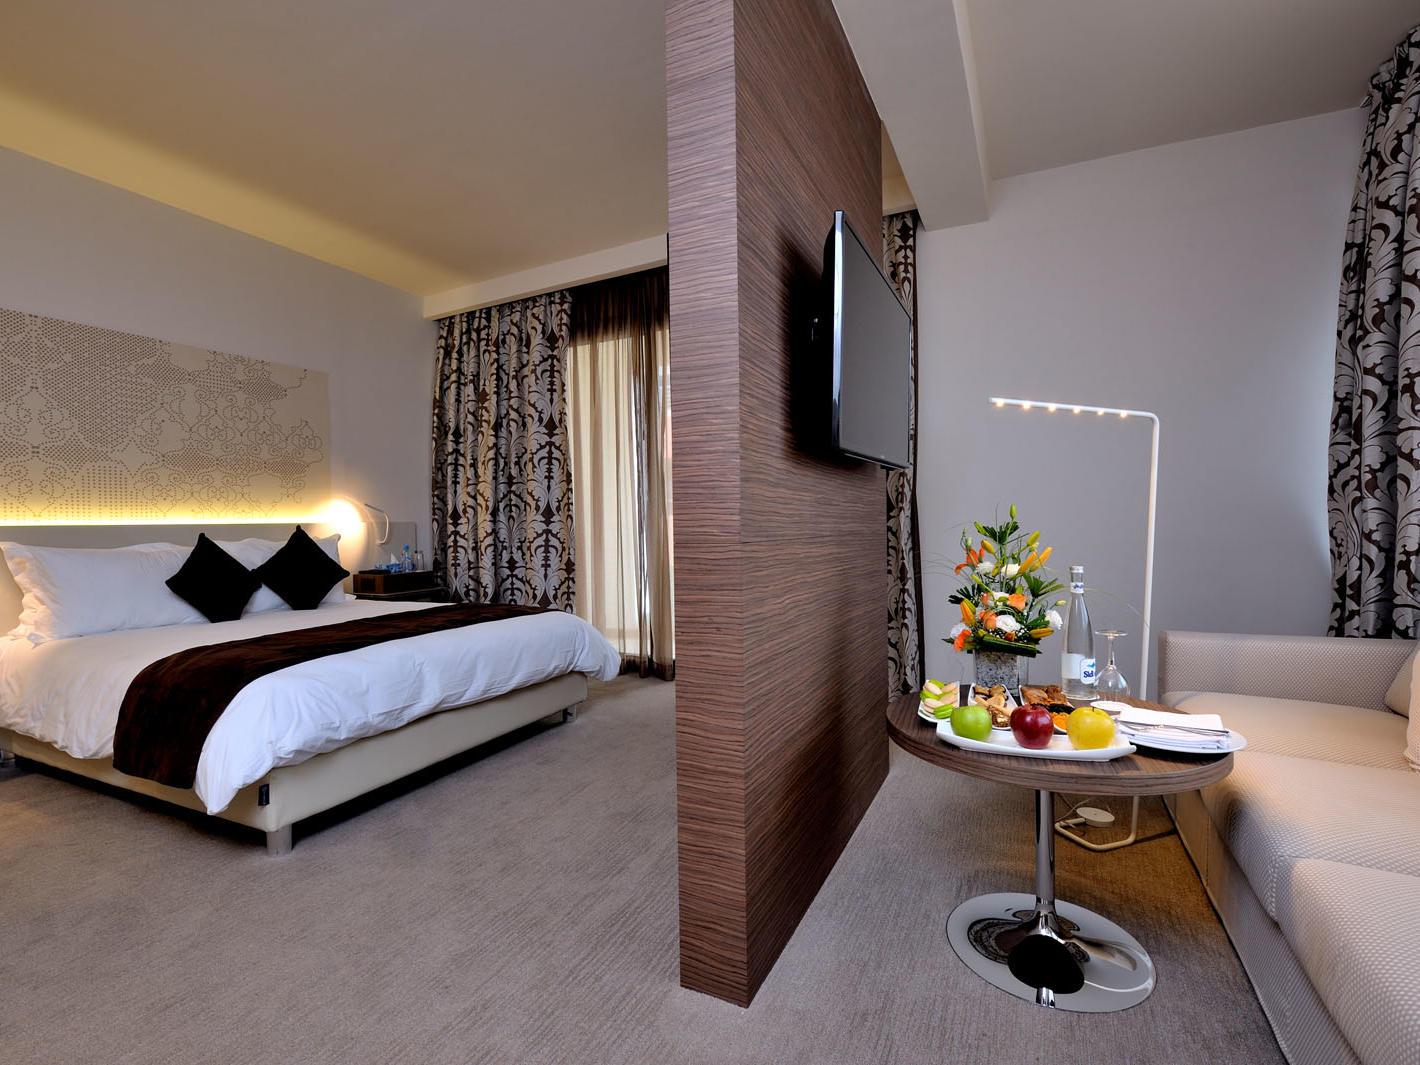 Junior Suite at Kenzi Sidi Maarouf Hotel in Casablanca, Morocco